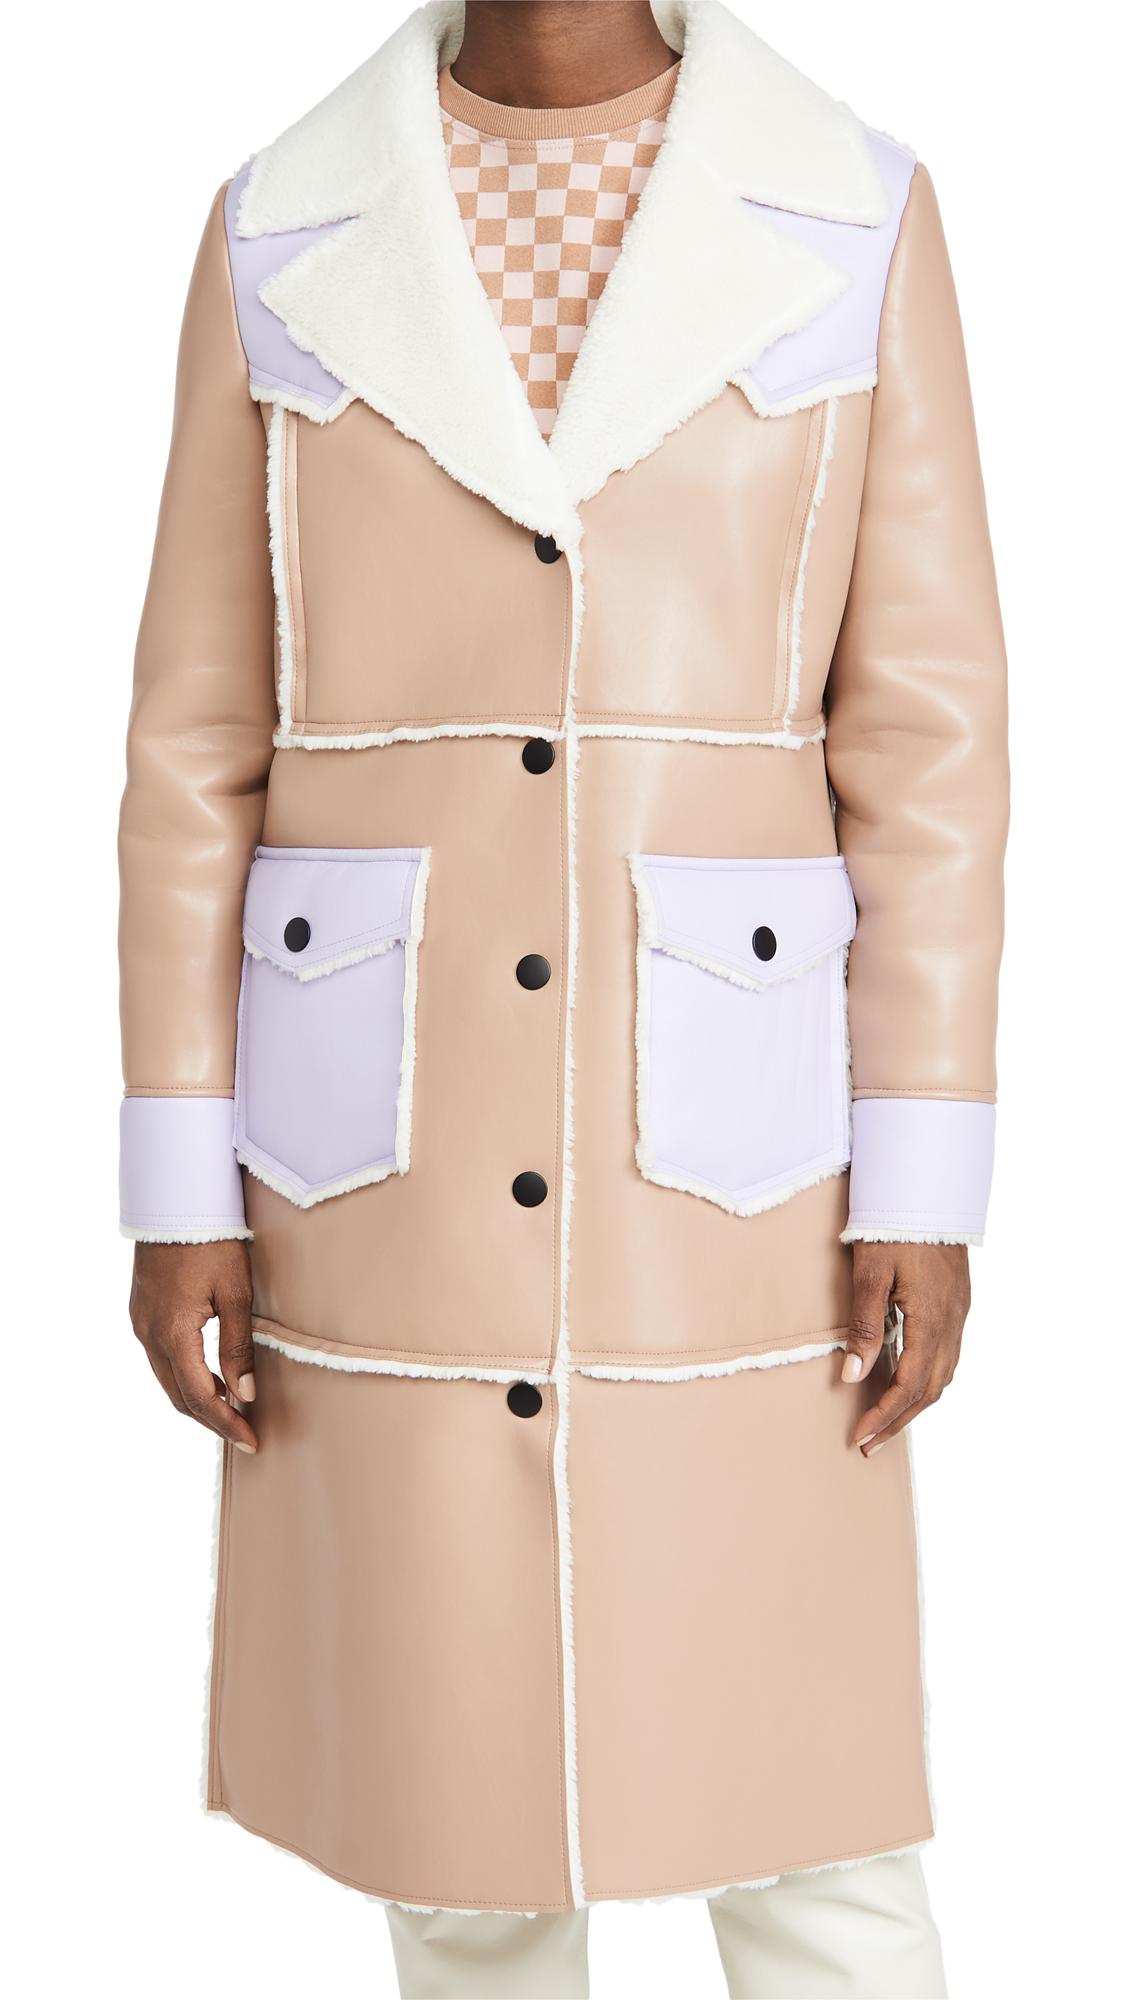 STAND STUDIO Adele Coat